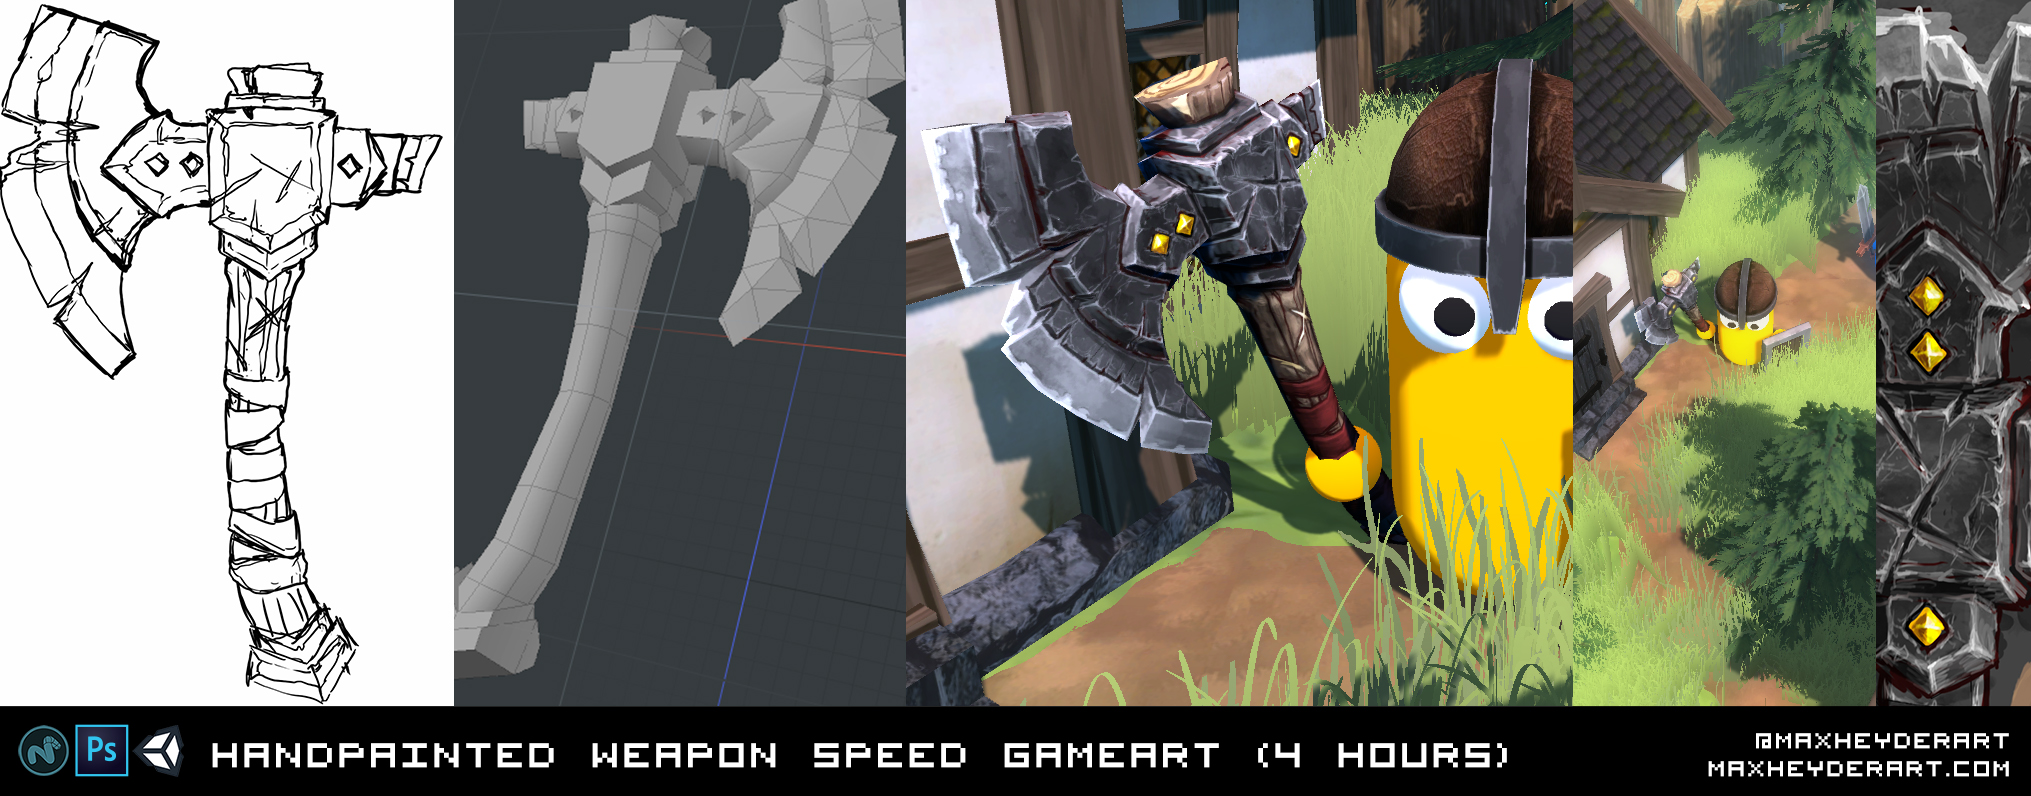 170419 Weapon SpeedArt